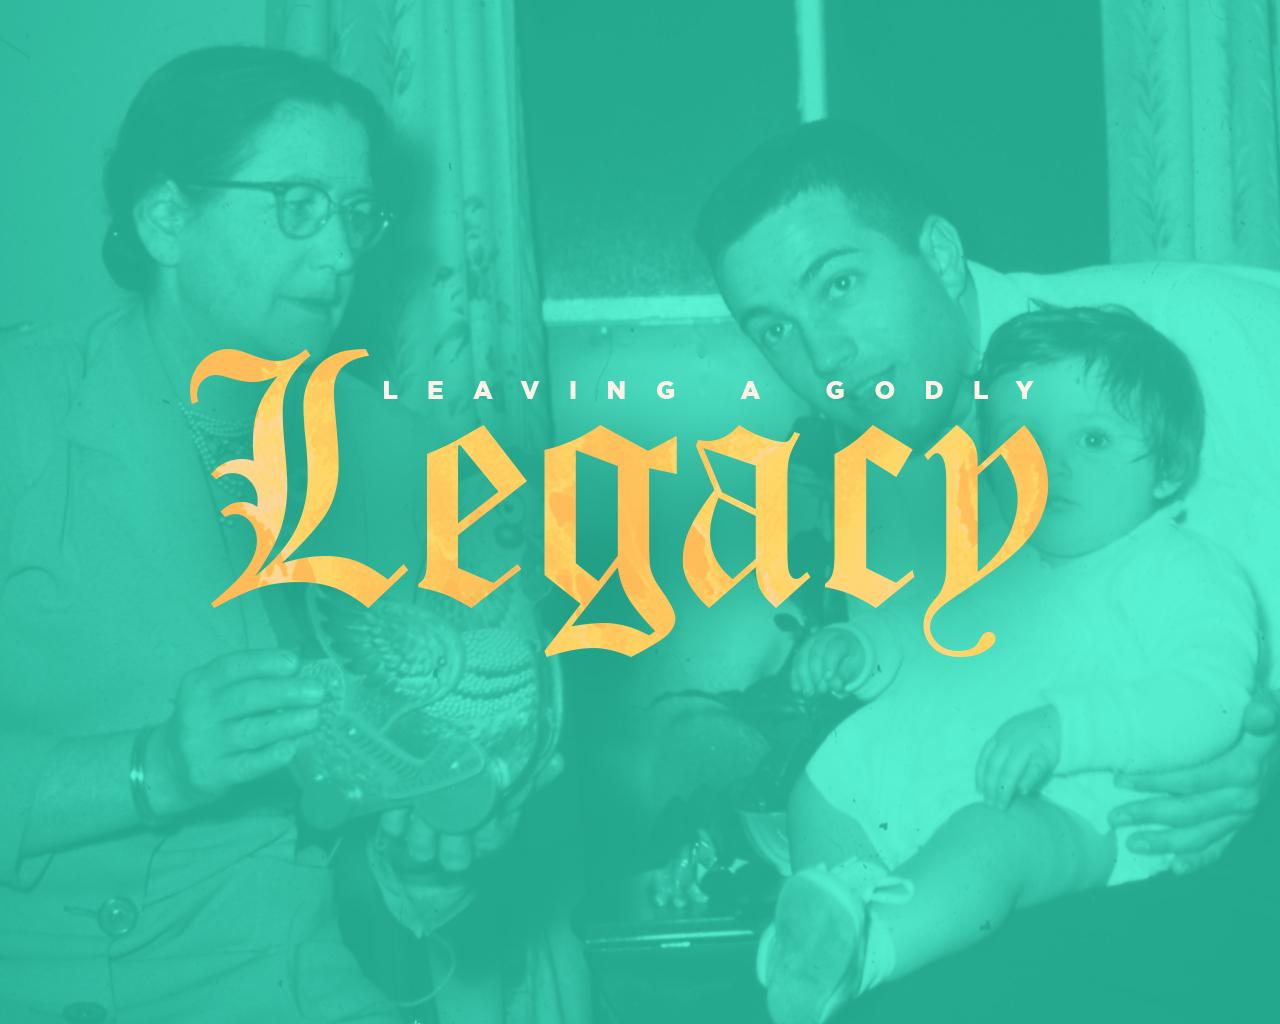 LeavingAGodlyLegacy.jpg